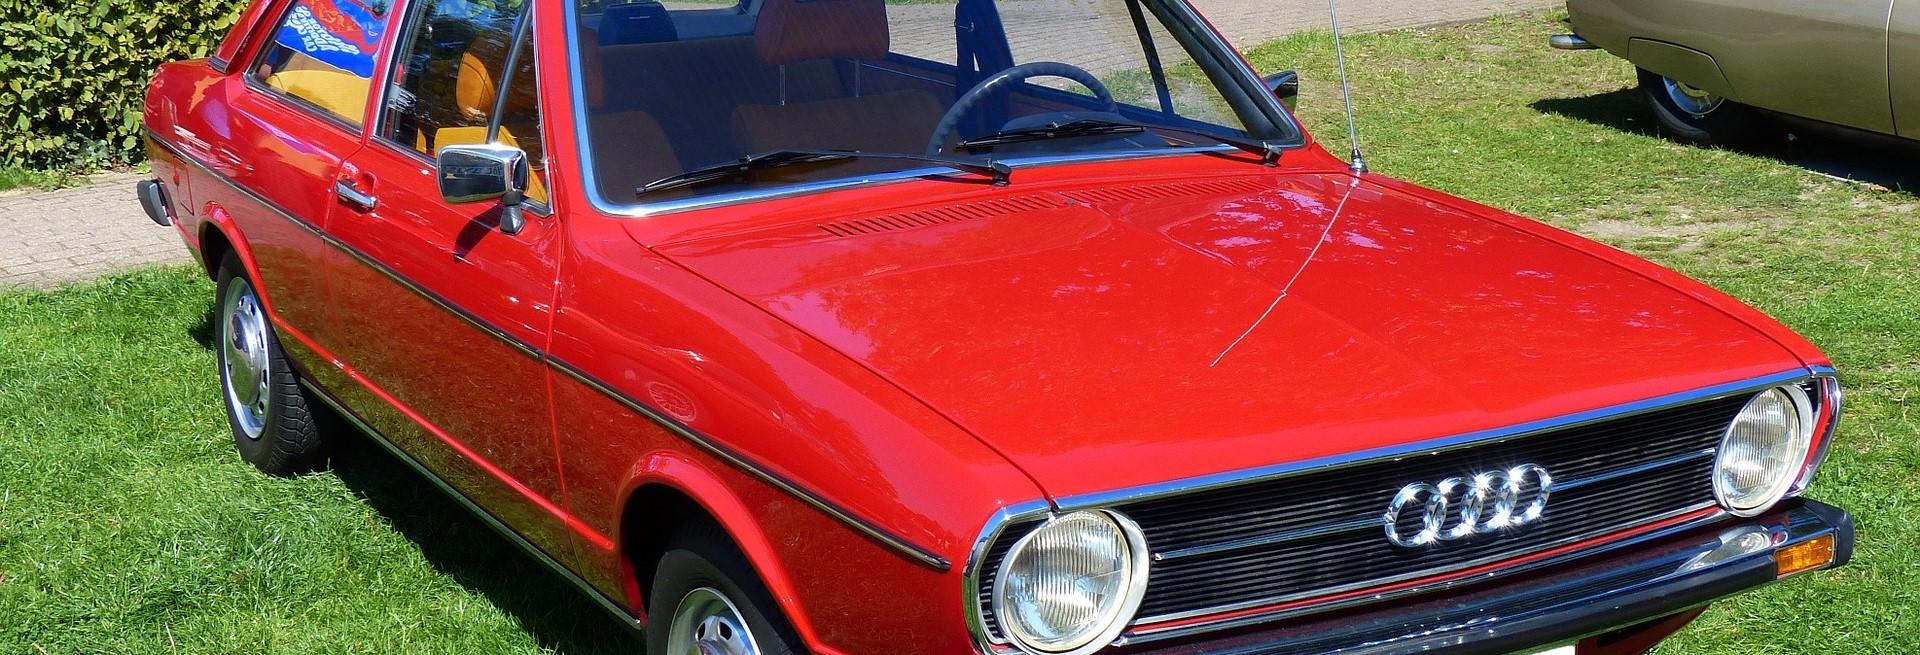 Oldtimer Car in Palo Alto, California | Breast Cancer Car Donations